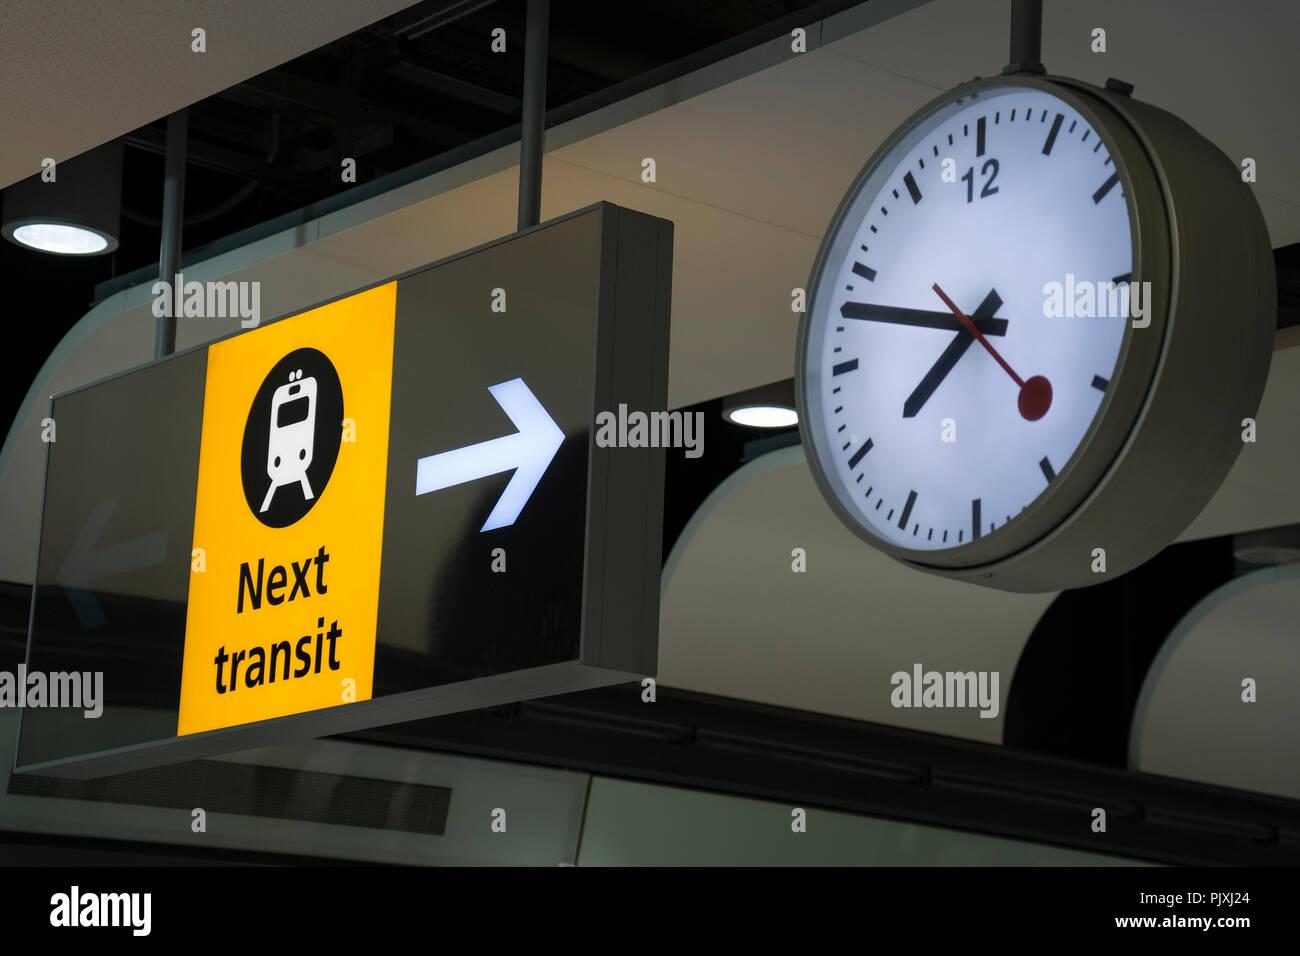 Airport transit shuttle signage,Heathrow,London,England - Stock Image